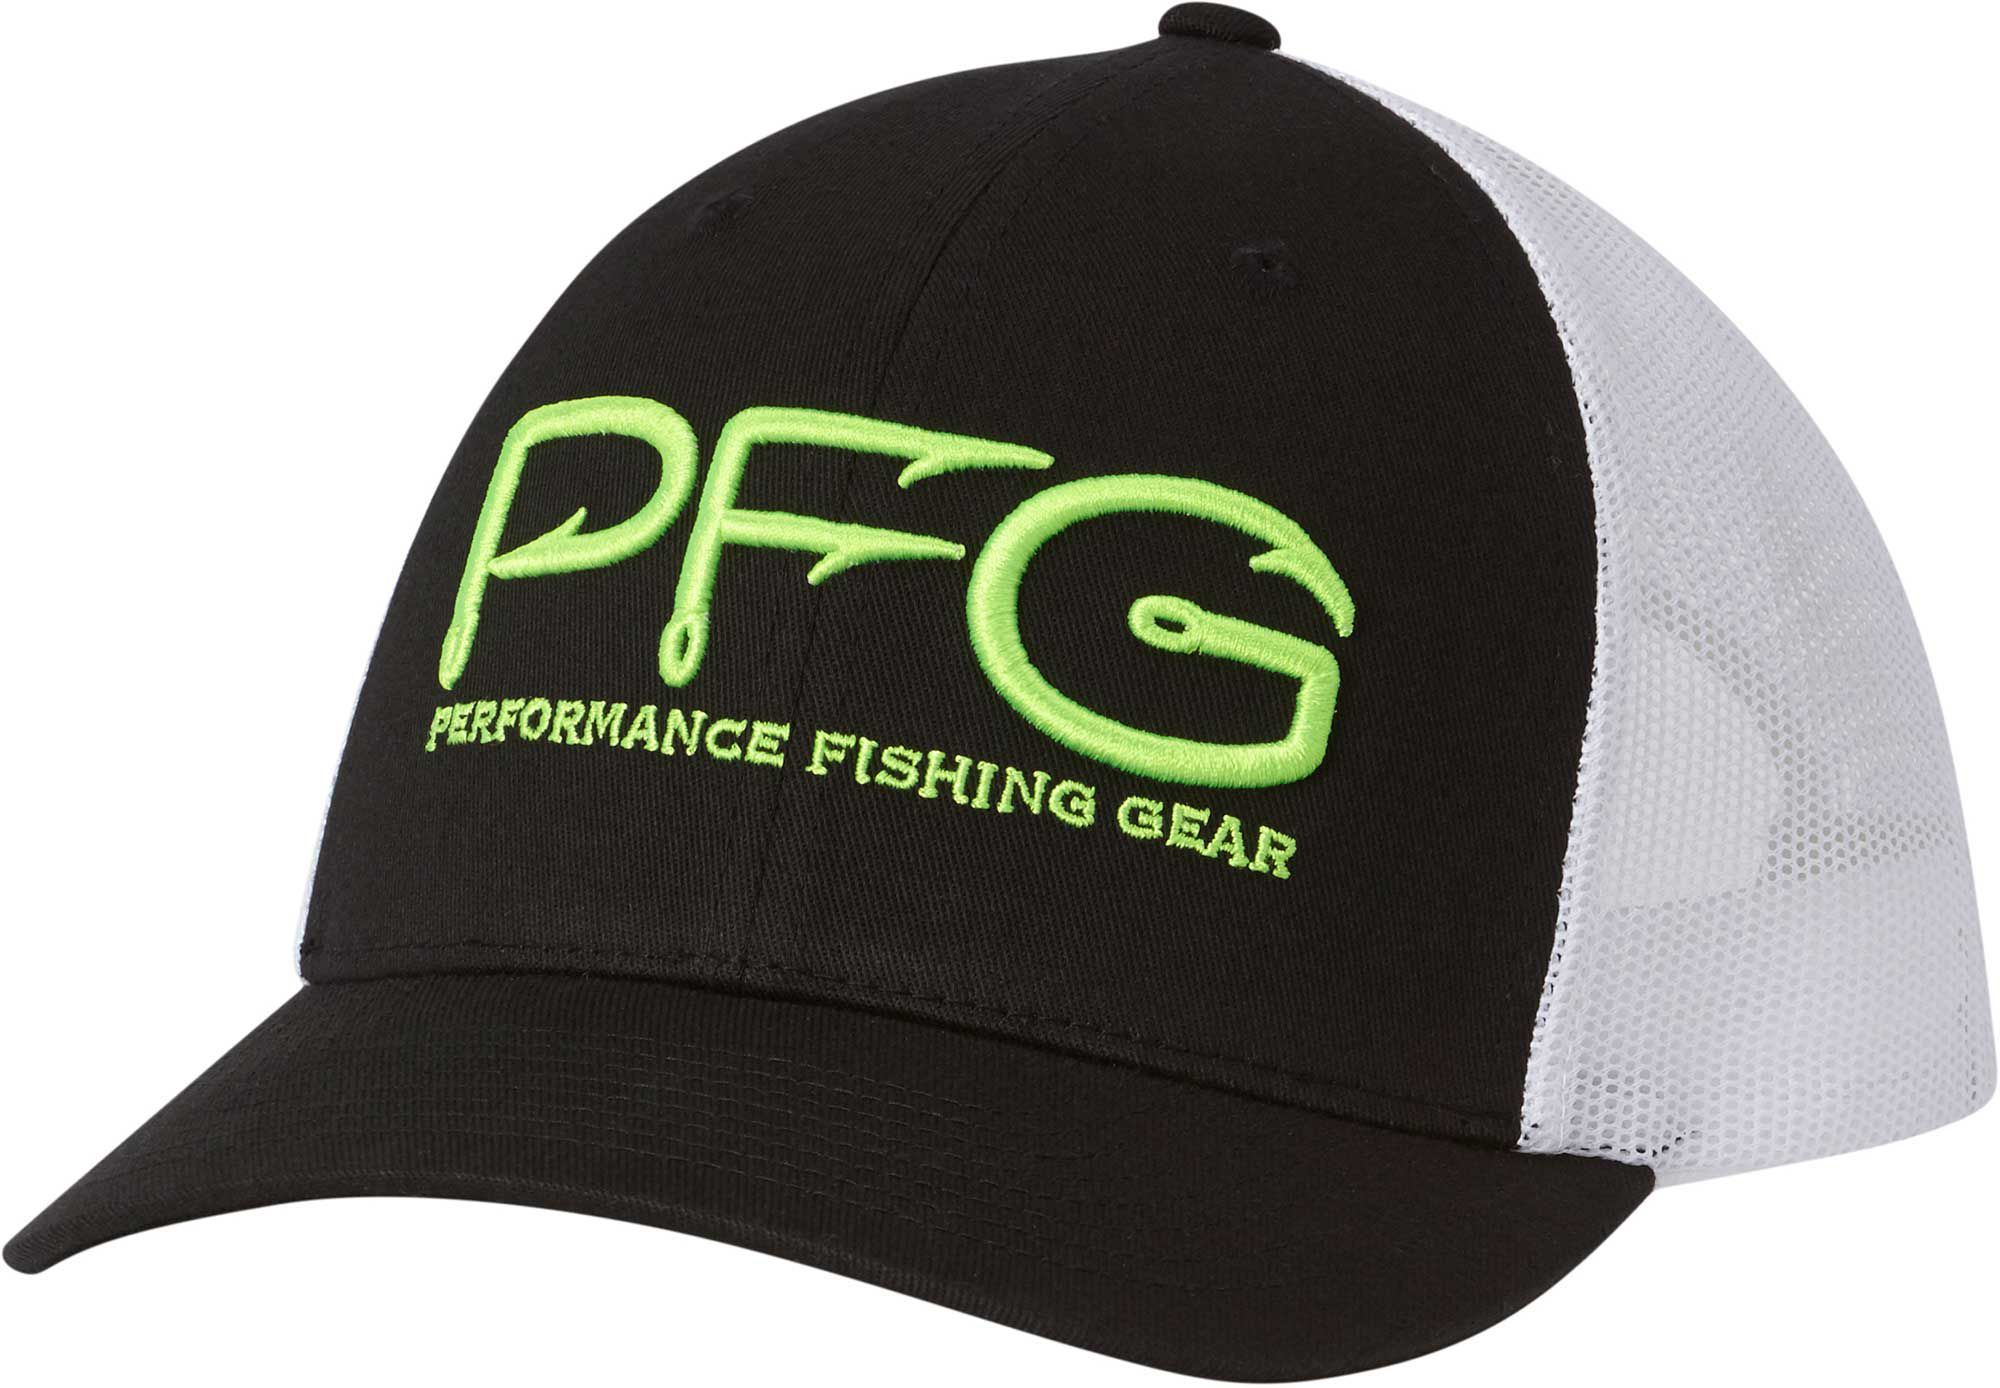 c0d98ab5864ec Columbia Sportswear Adults  Performance Fishing Gear Mesh Ball Cap ...